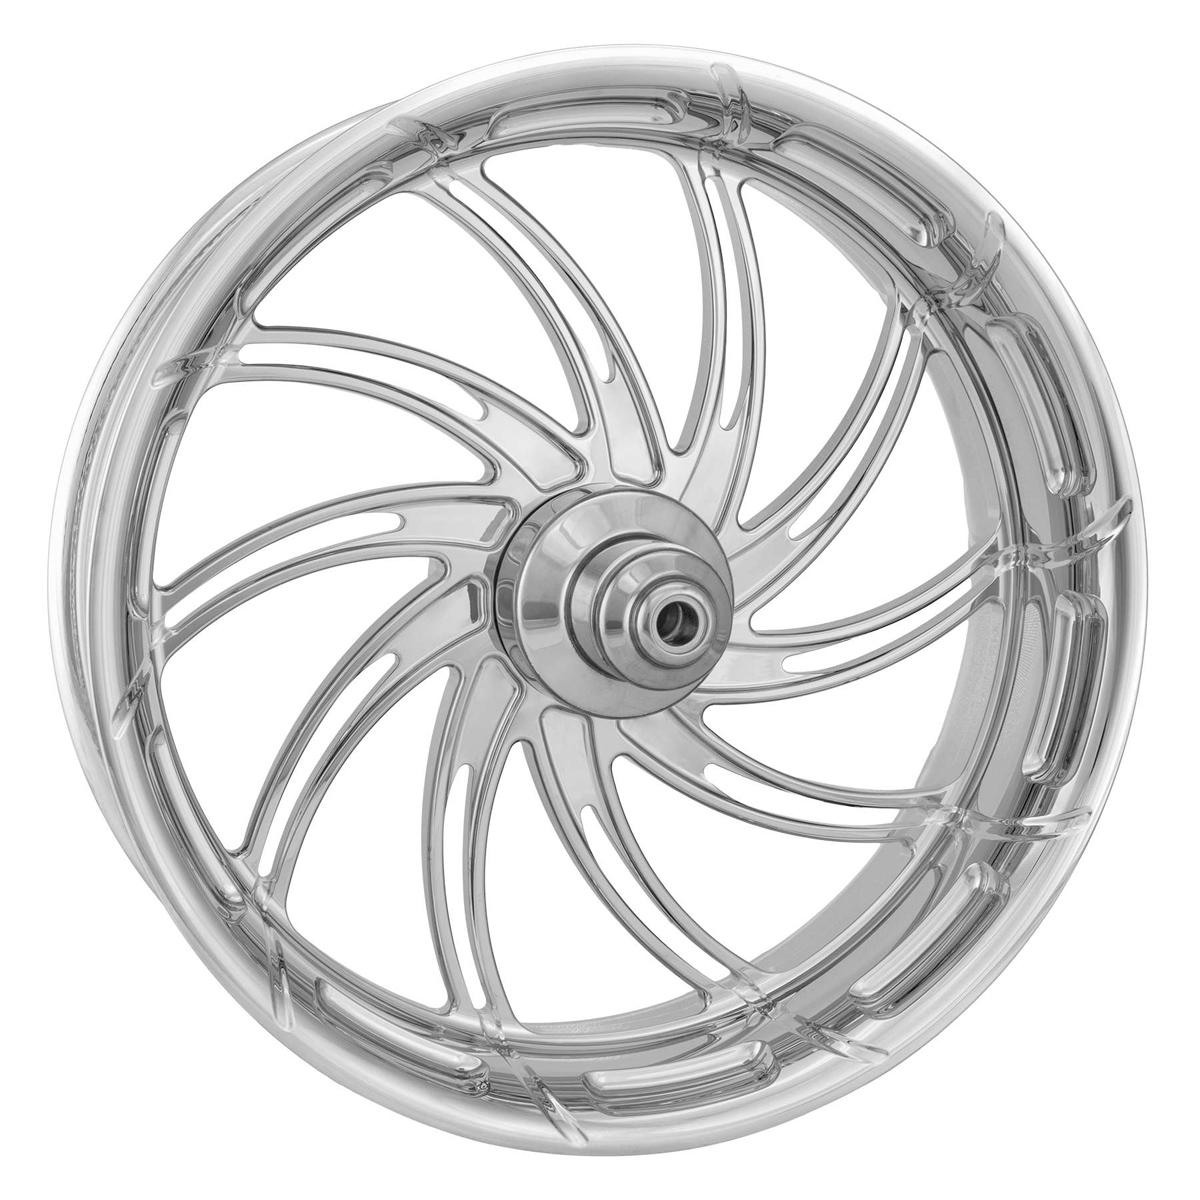 Performance Machine Supra Chrome Rear Wheel 18x3.5 Non-ABS